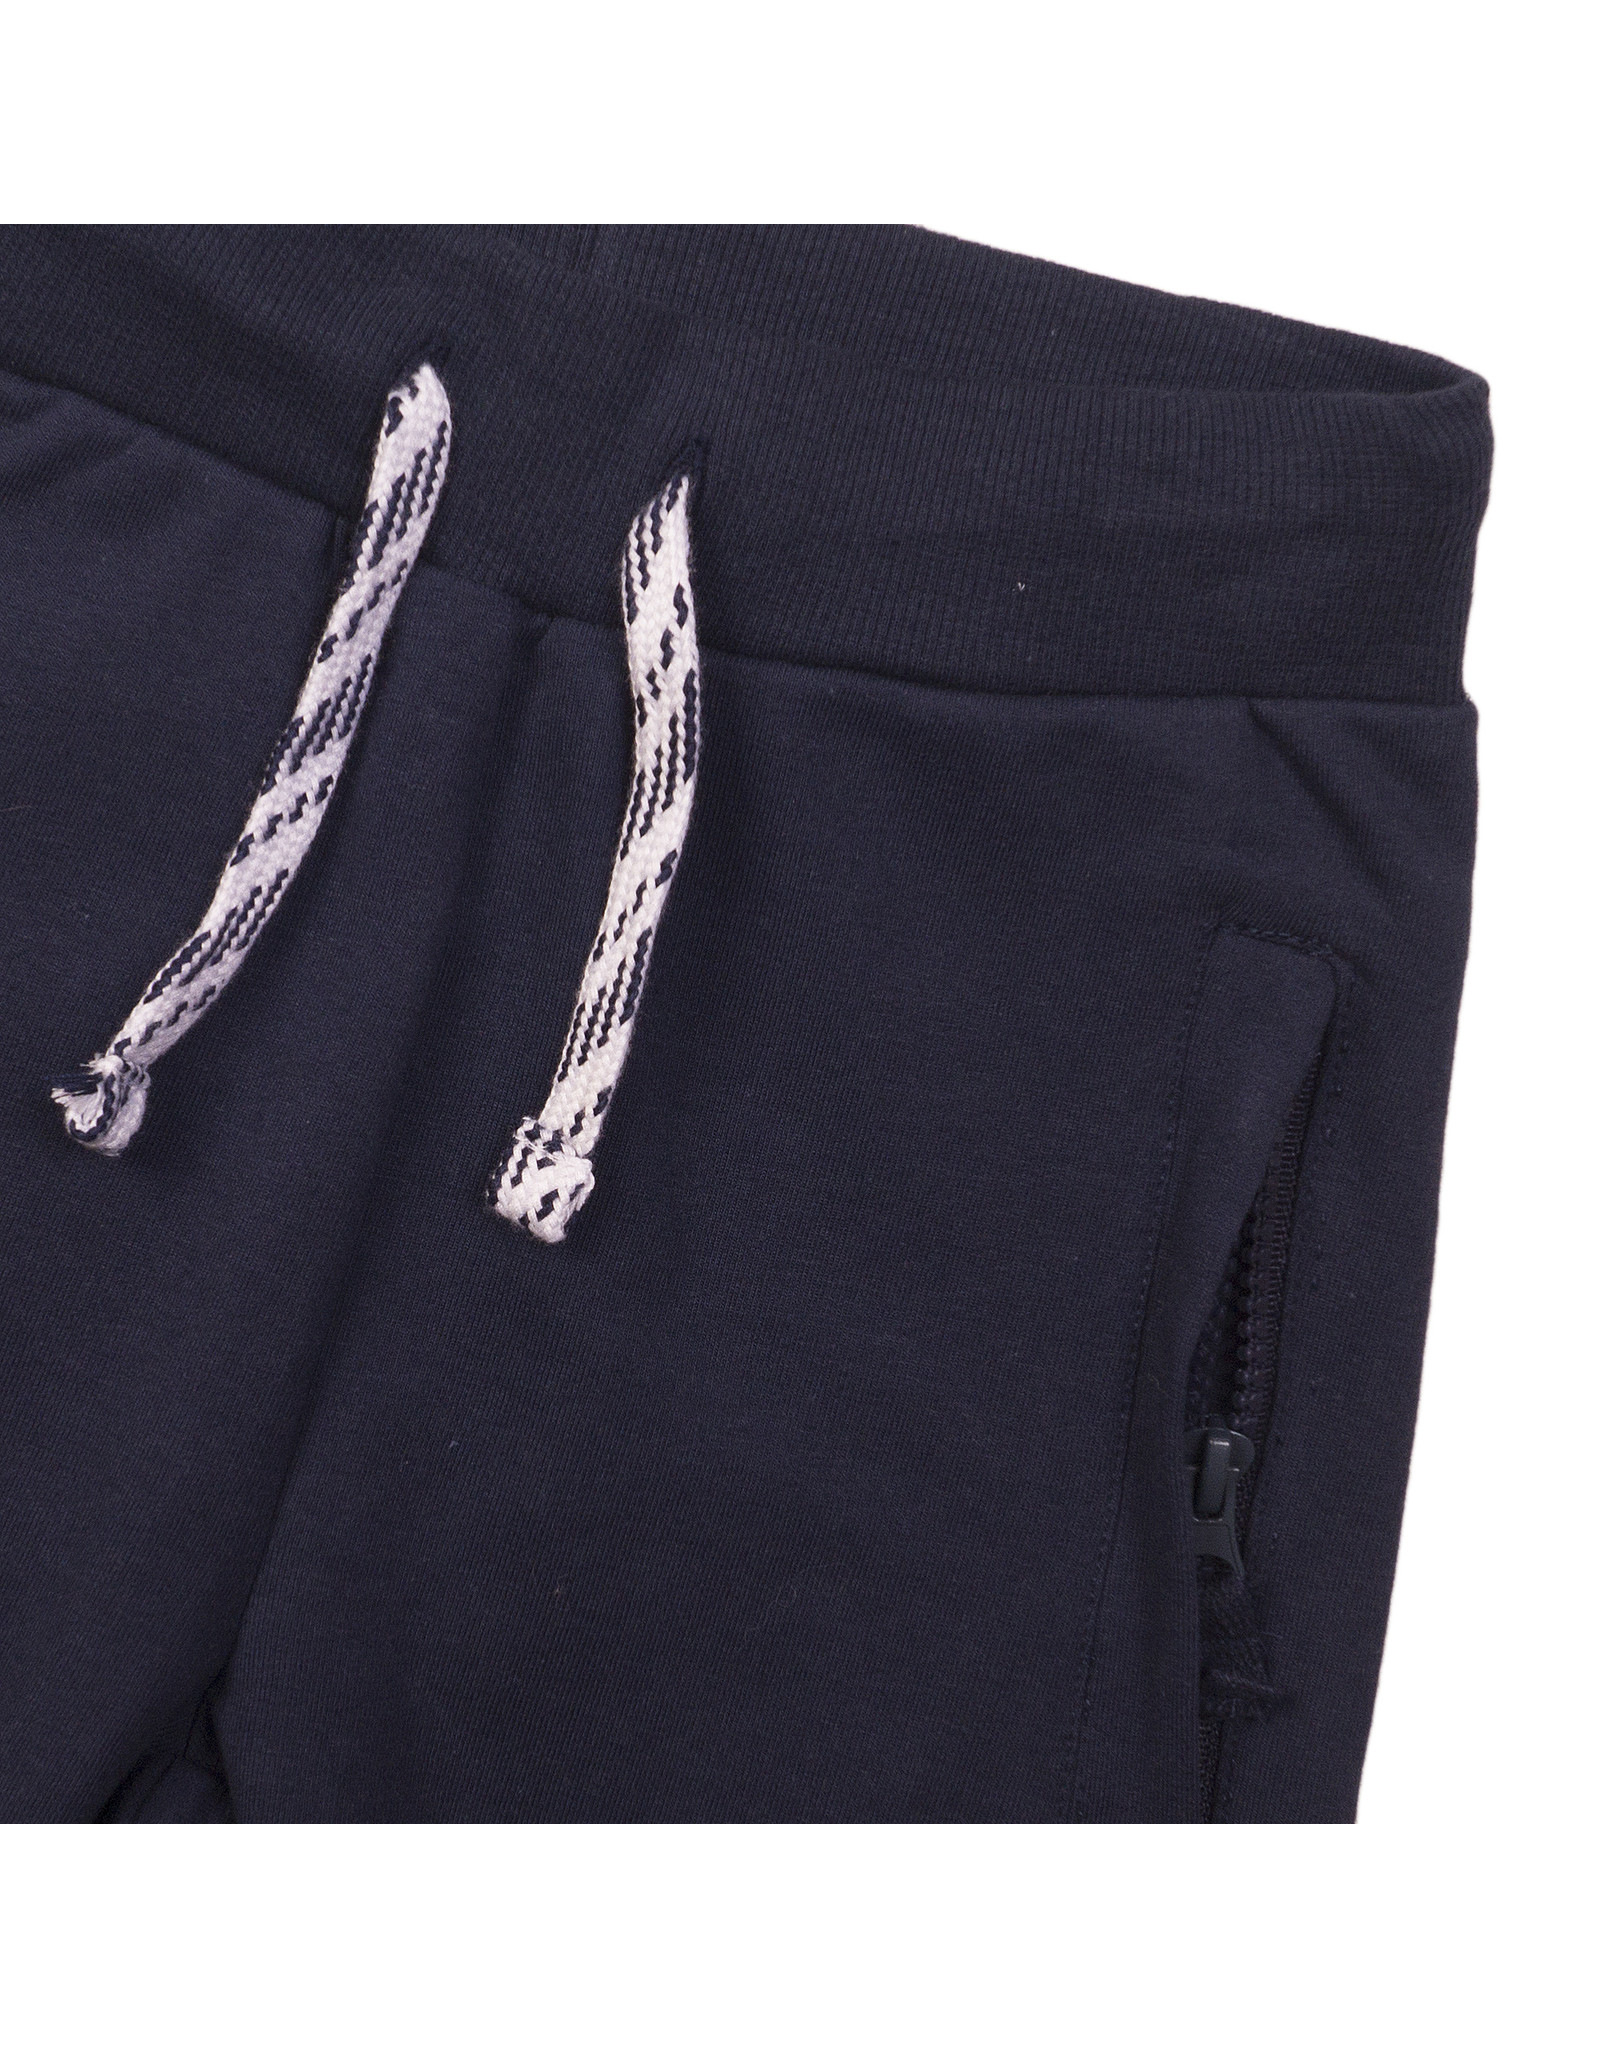 Dutch Jeans Jogging shorts, Navy